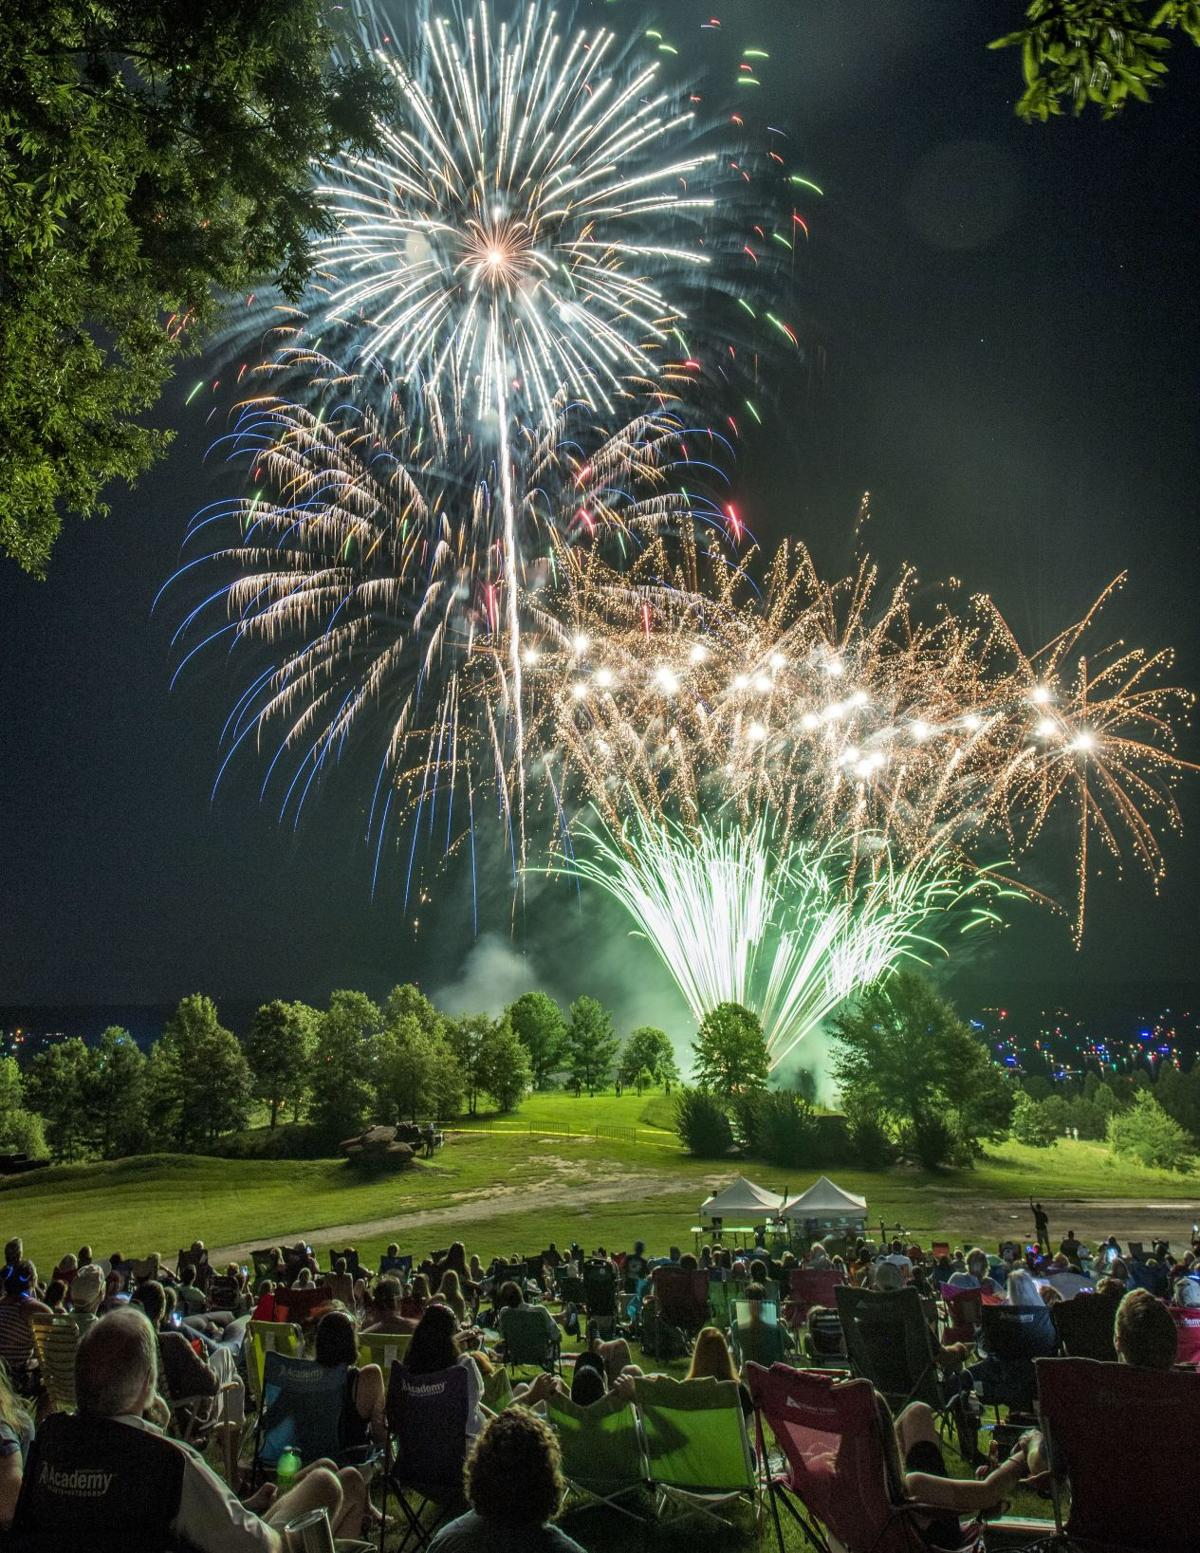 Fireworks_2039_20170704.tif